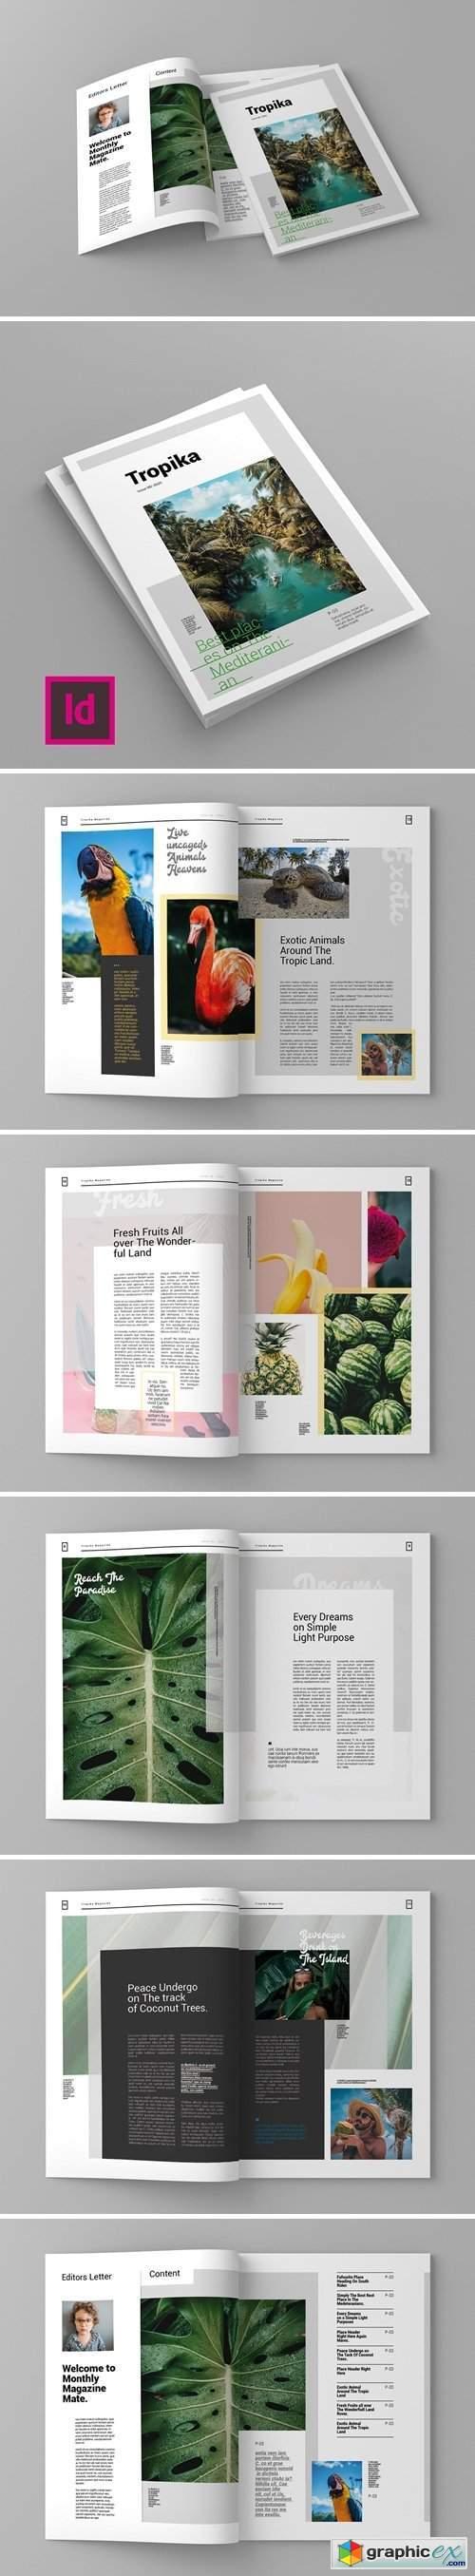 Tropika - Magazine Template